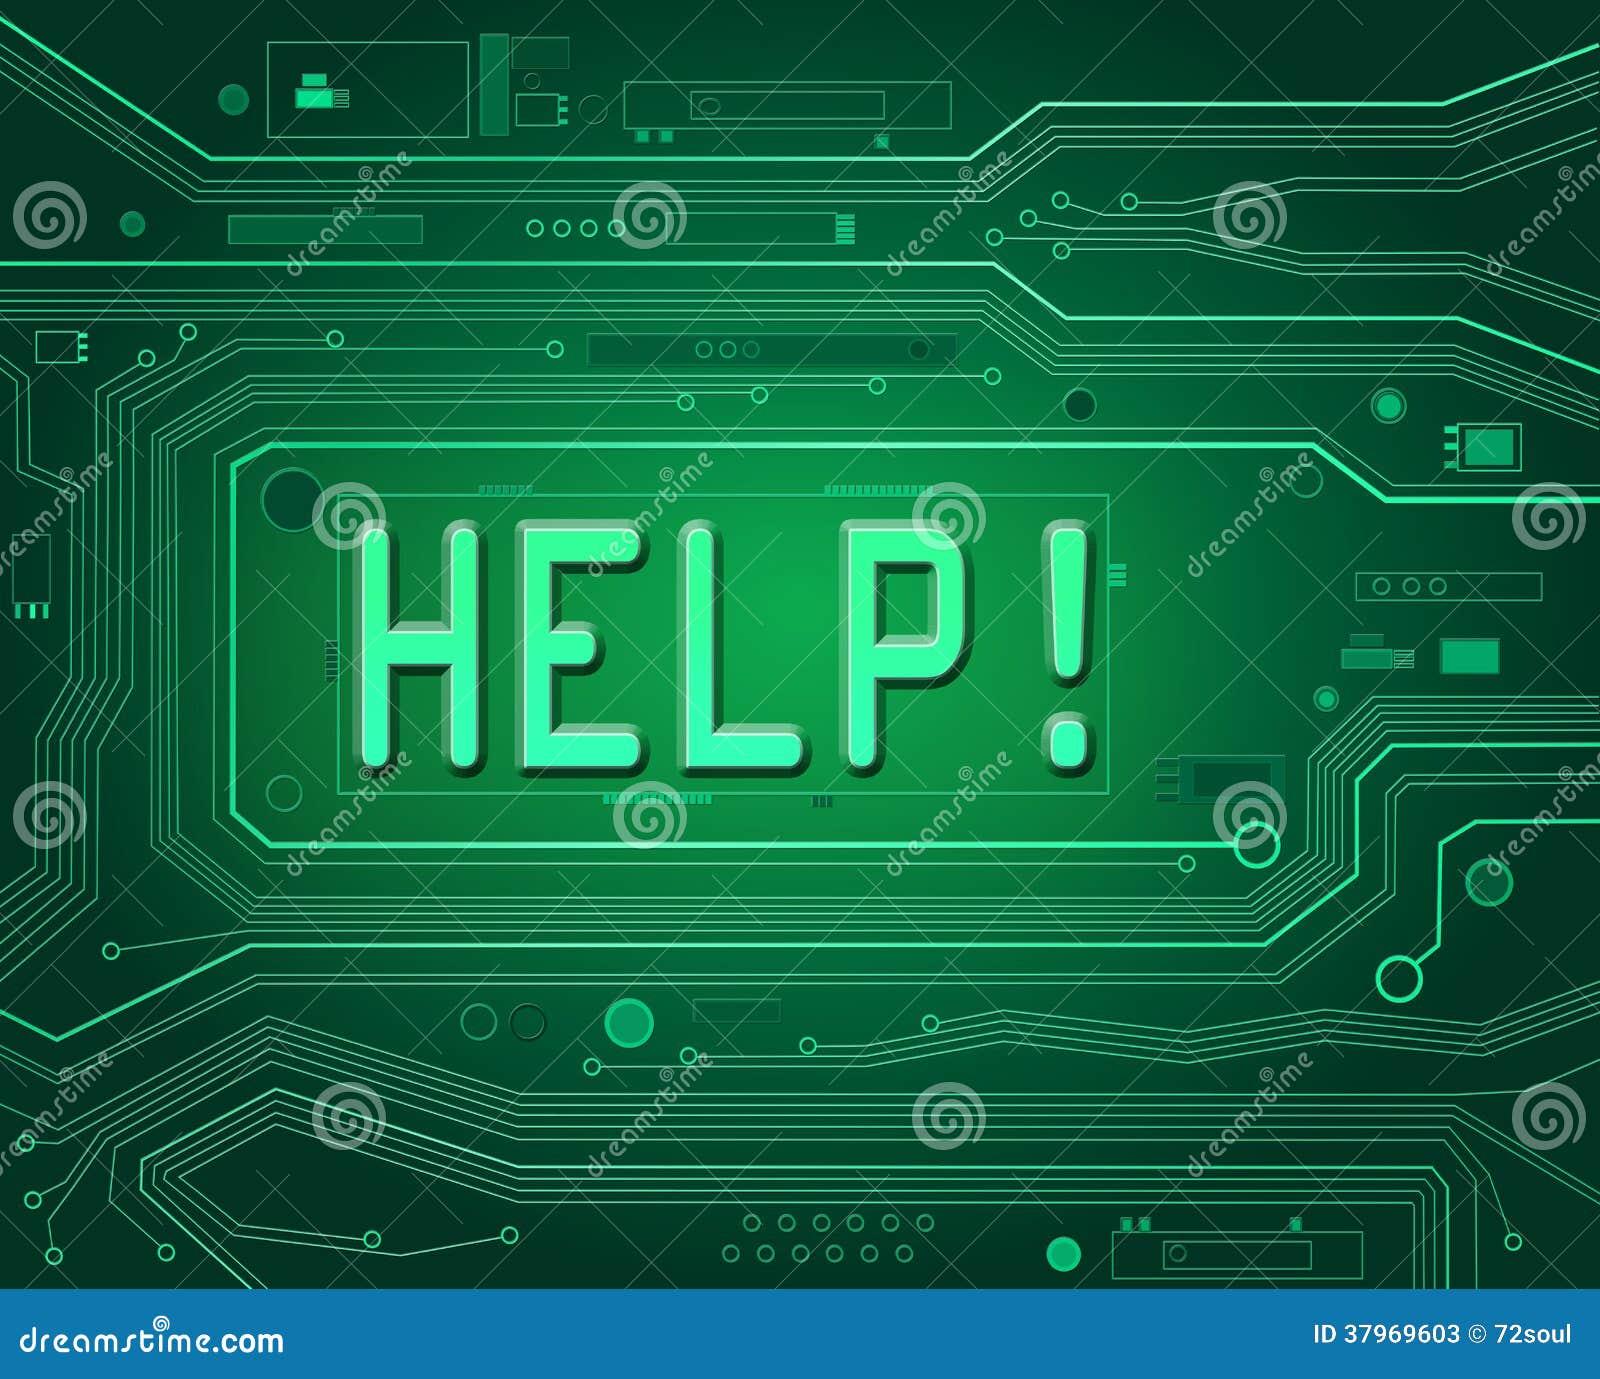 Technical Help Concept  Stock Illustration  Illustration